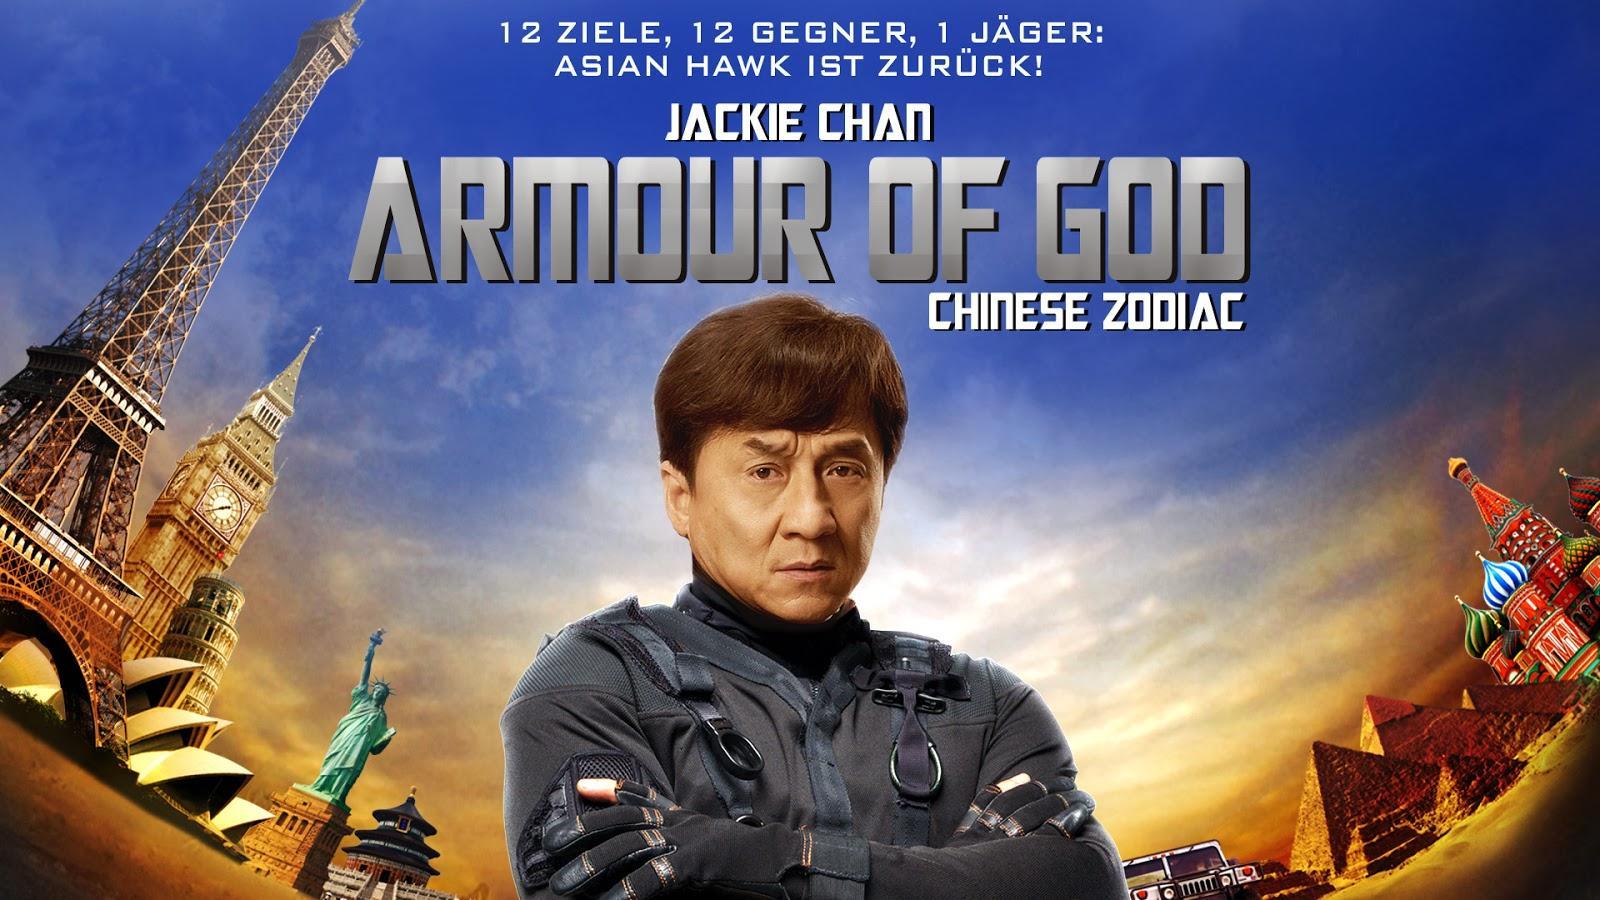 [ Movies ] Armour of God (Bong neak Pa oun Kla) - Khmer Movies, chinese movies, Short Movies -:- [ full movie ]